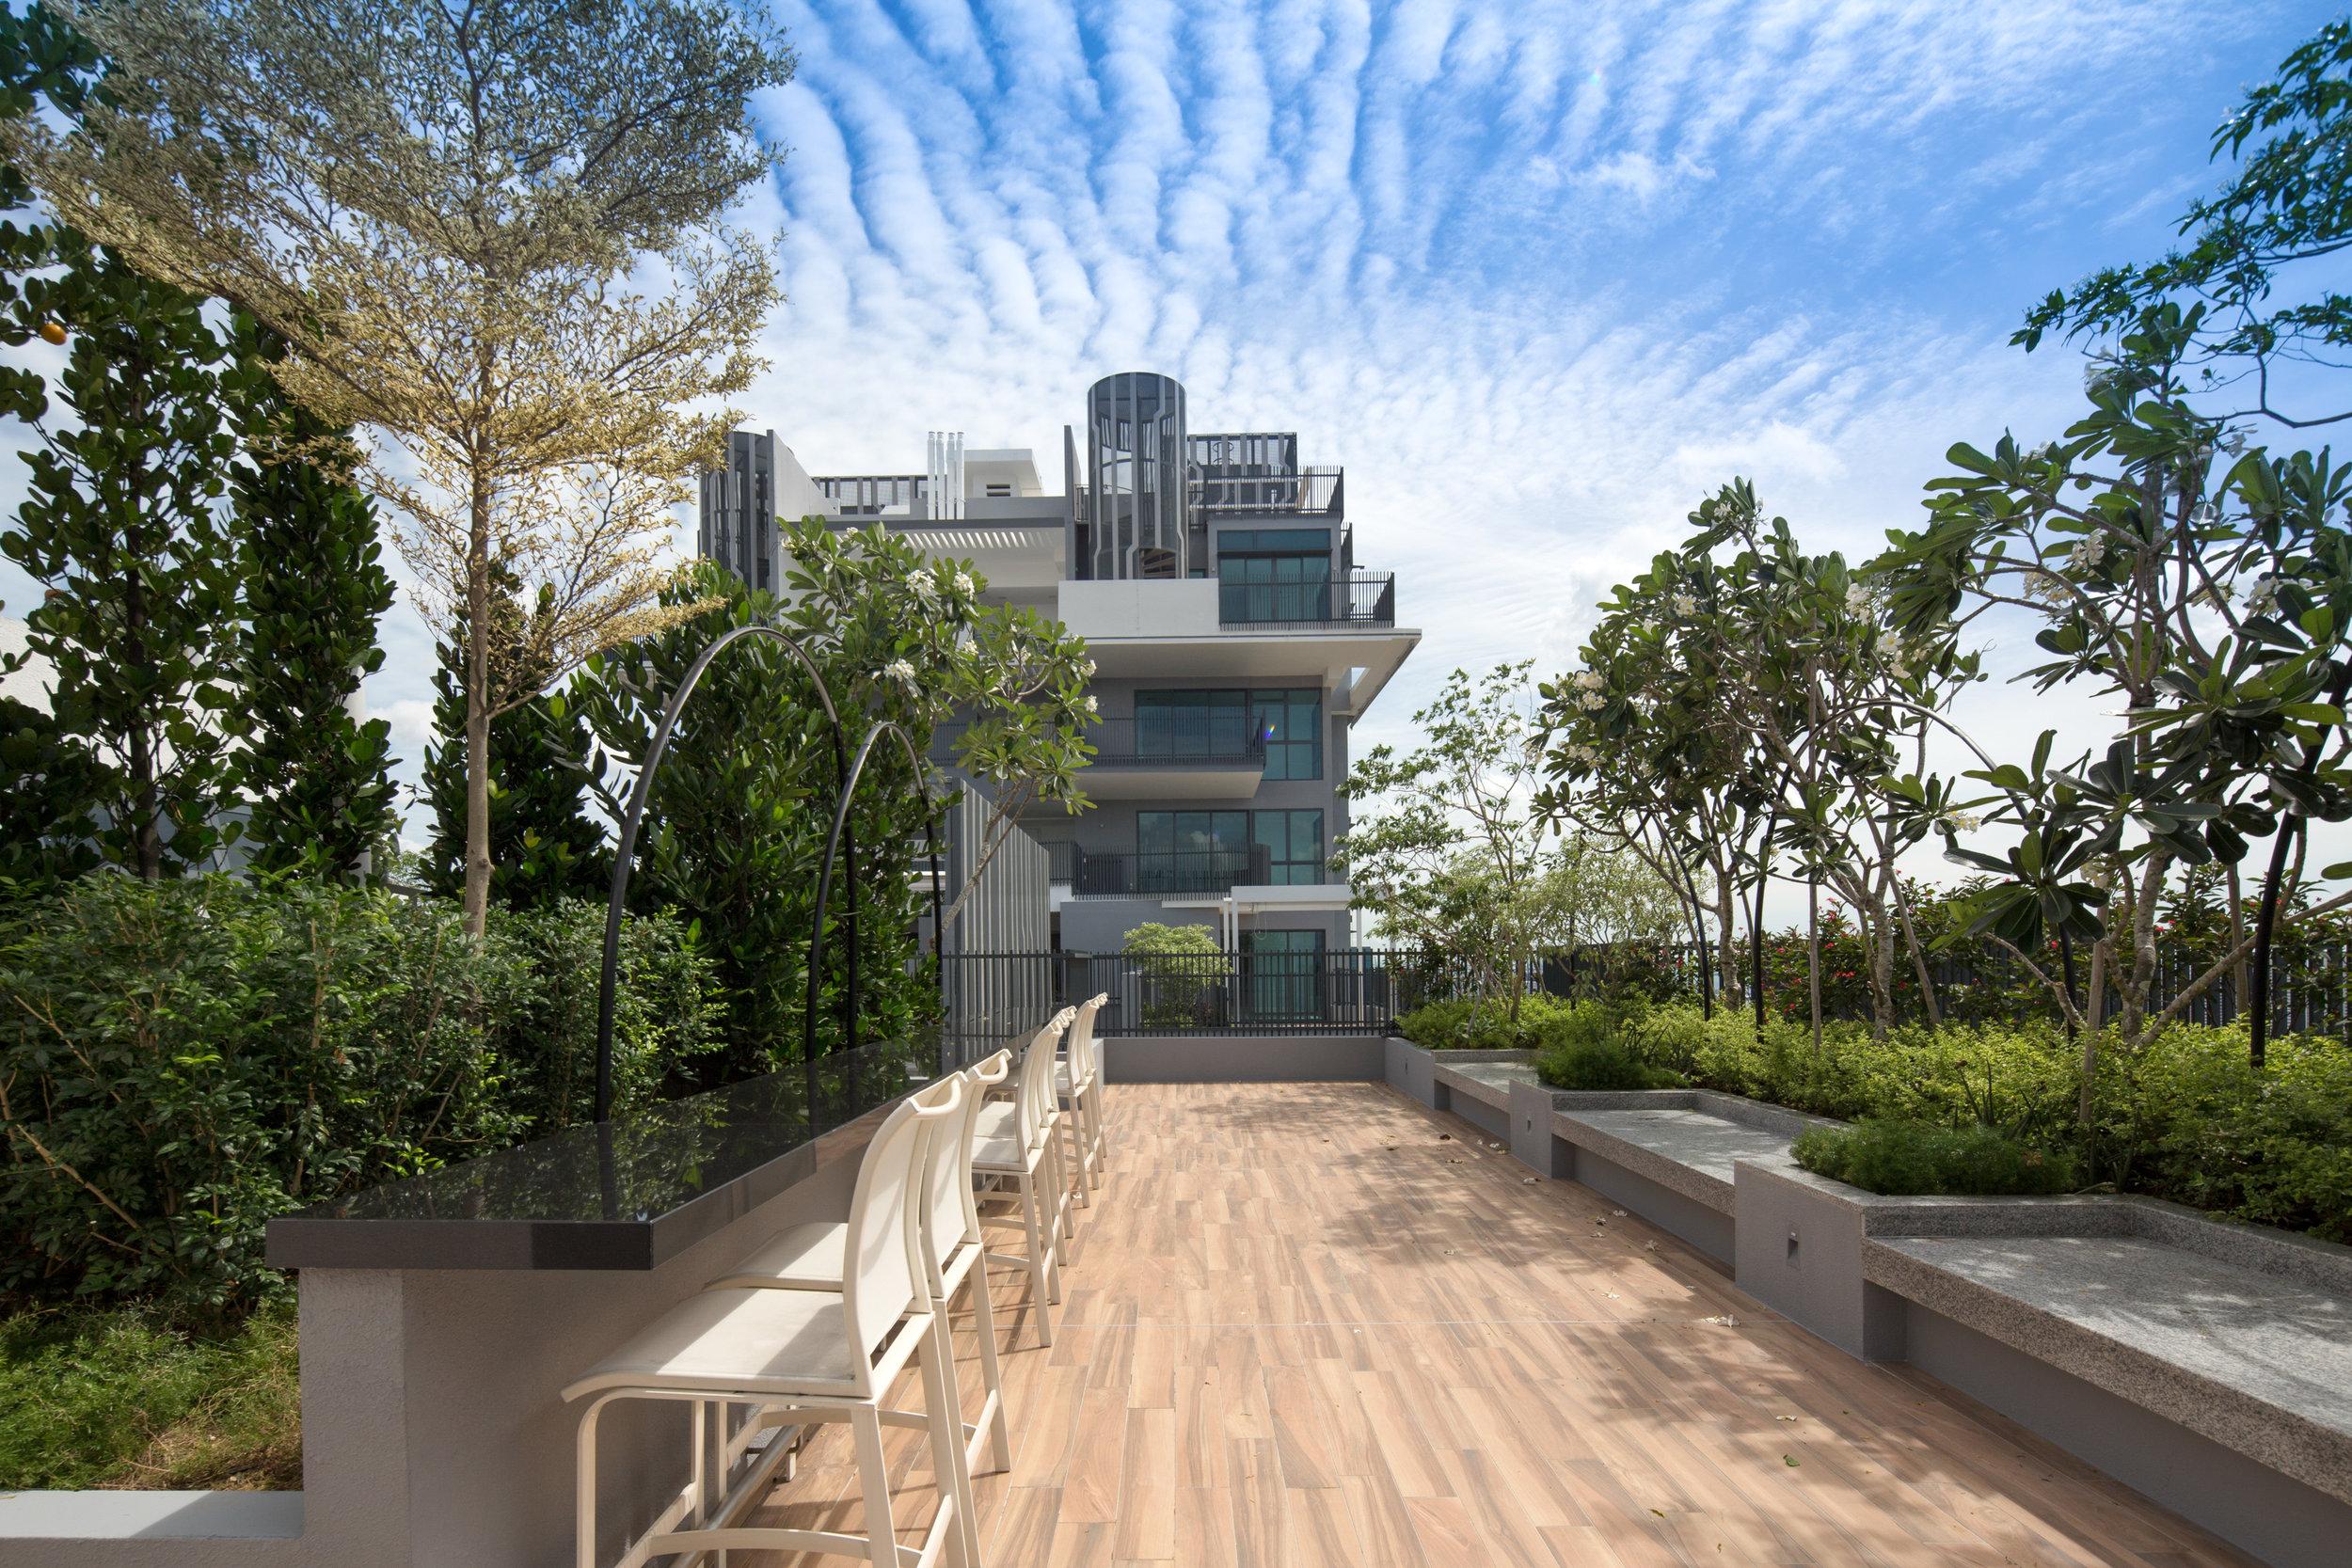 JG Exterior 8 Roof Terrace